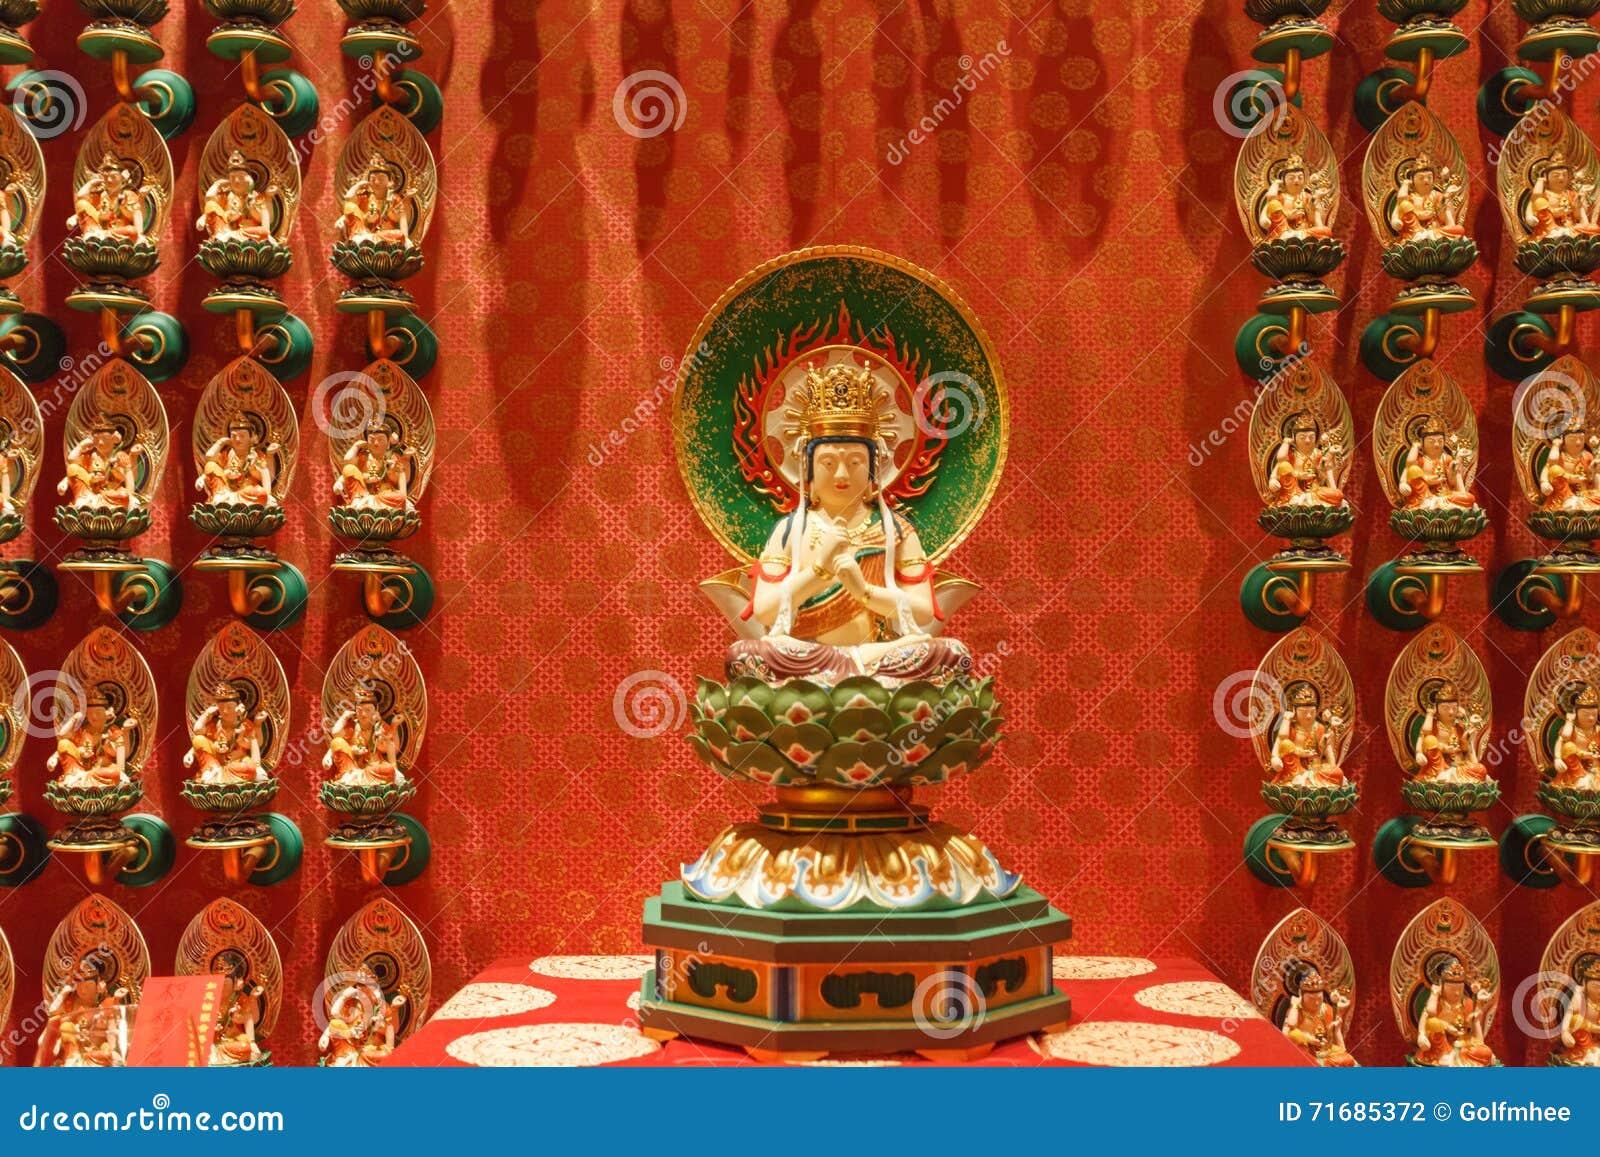 SINGAPORE/SINGAPORE - 27 BRENGEN, 2014 IN DE WAR: Rode Chinese tempel, Boedha